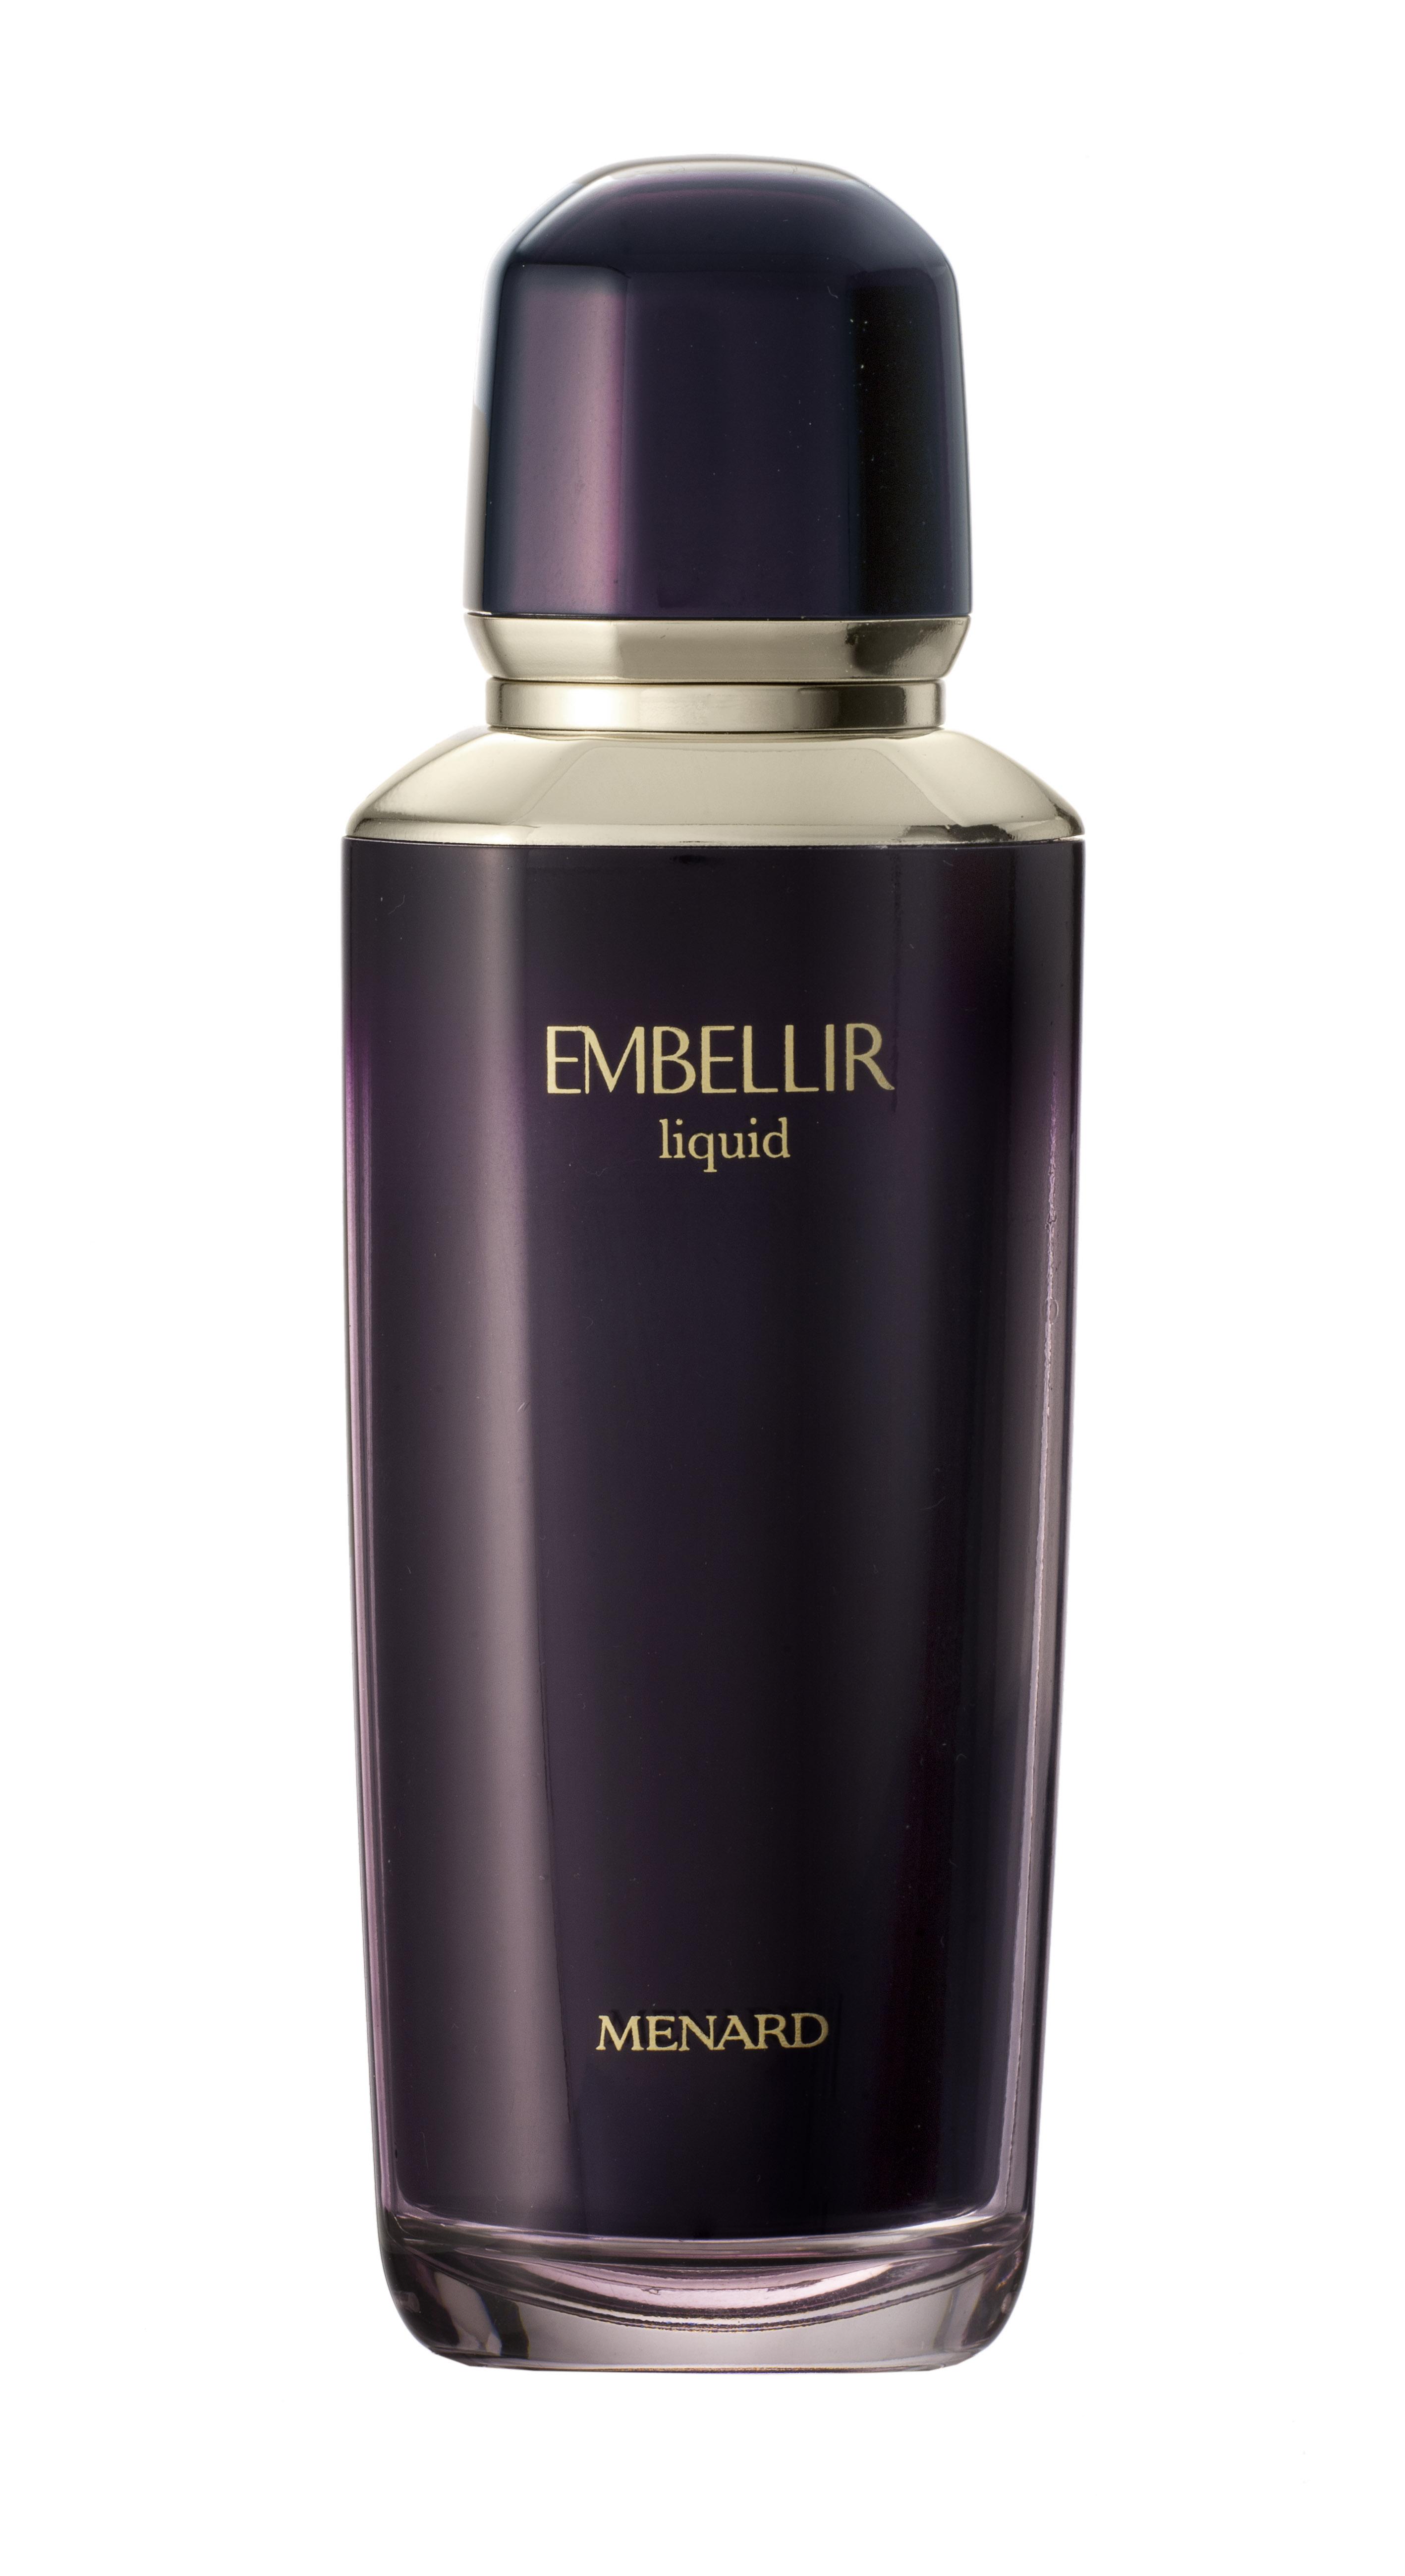 Menard Embellir Liquid